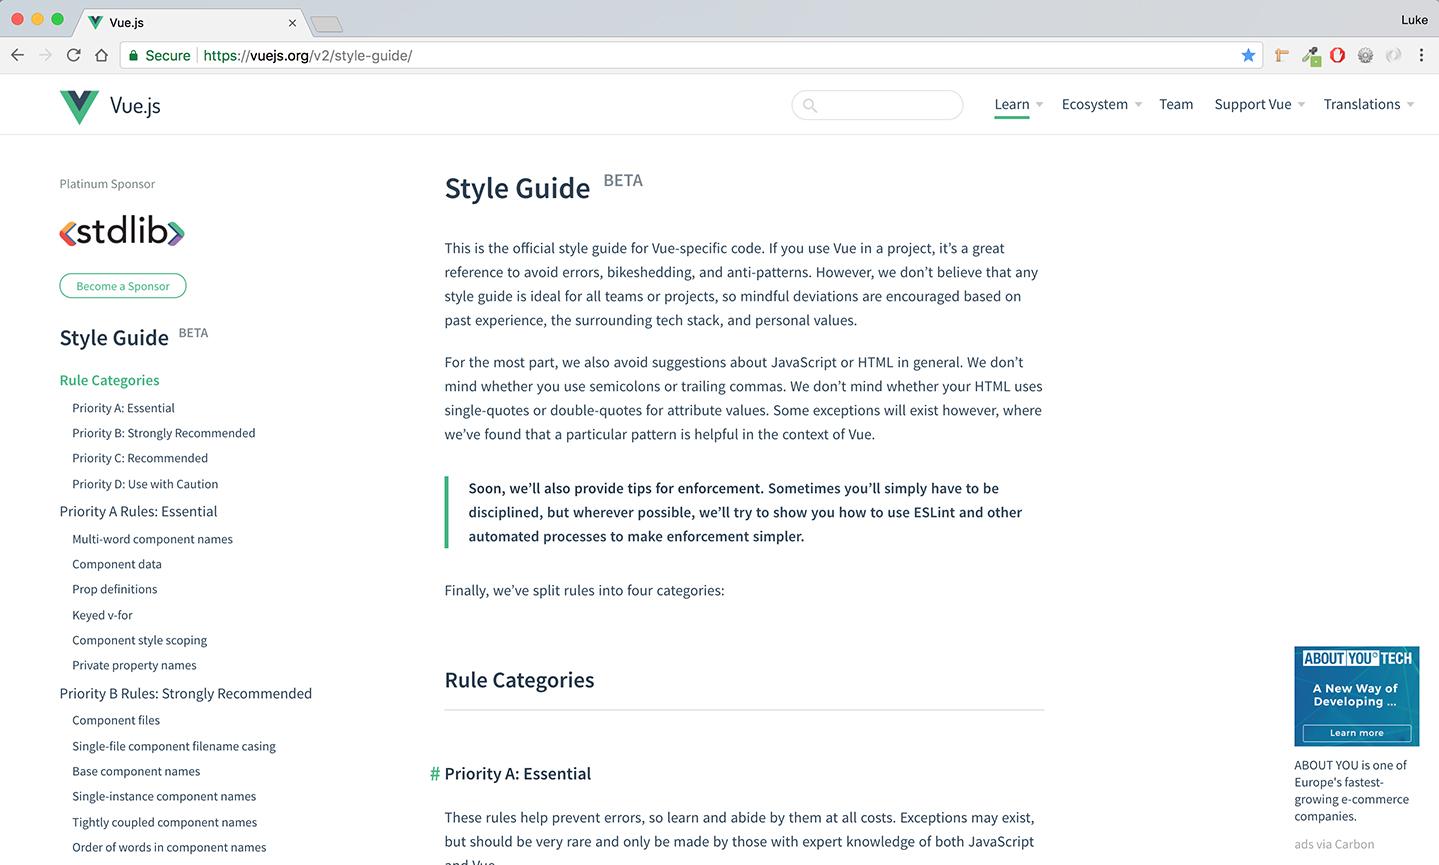 Create a flexible carousel component - Graphic Design